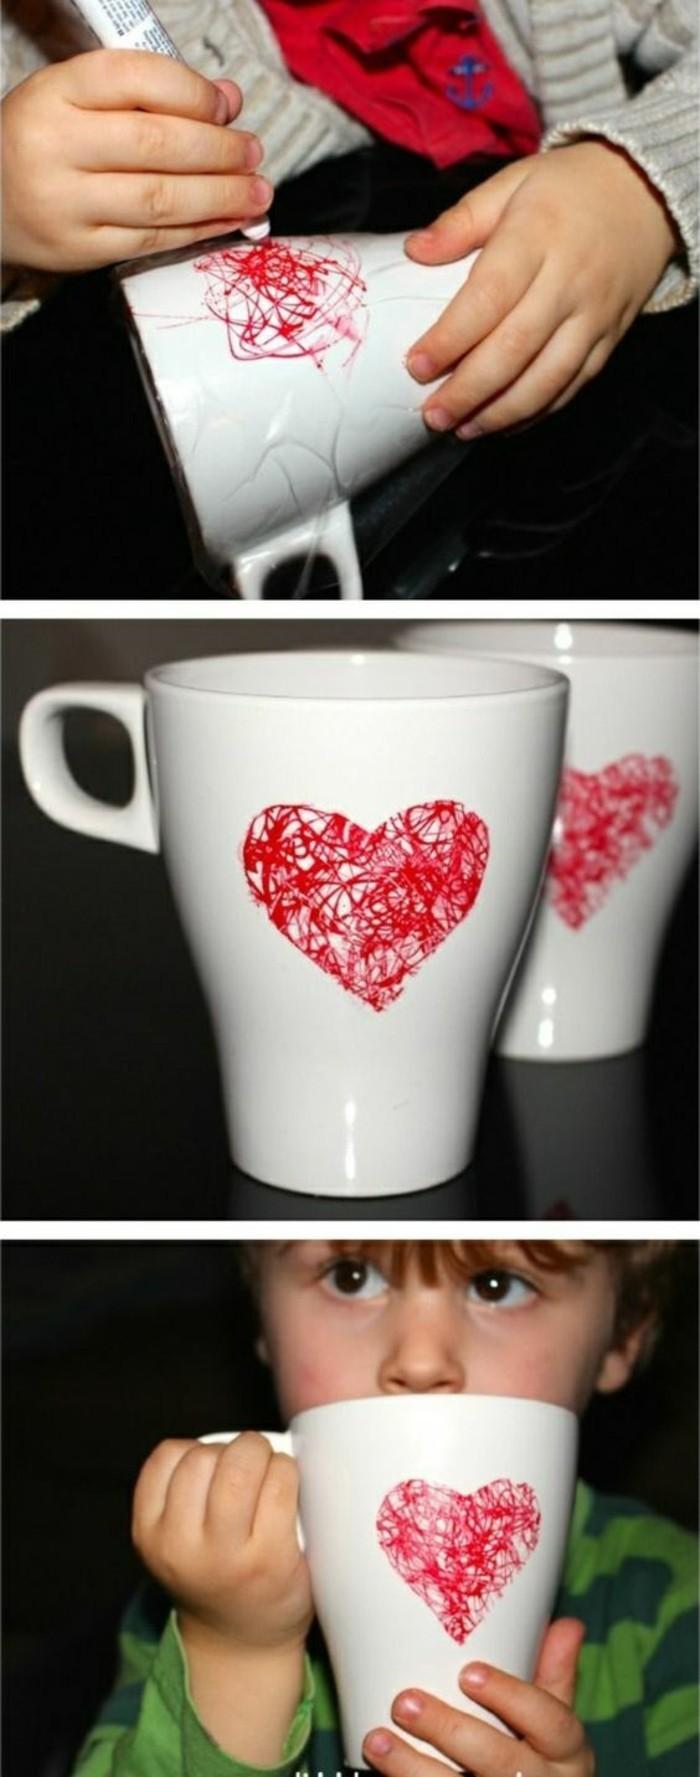 creative homemade gifts, white coffee mug, red heart, kid drawing on the mug, diy tutorial